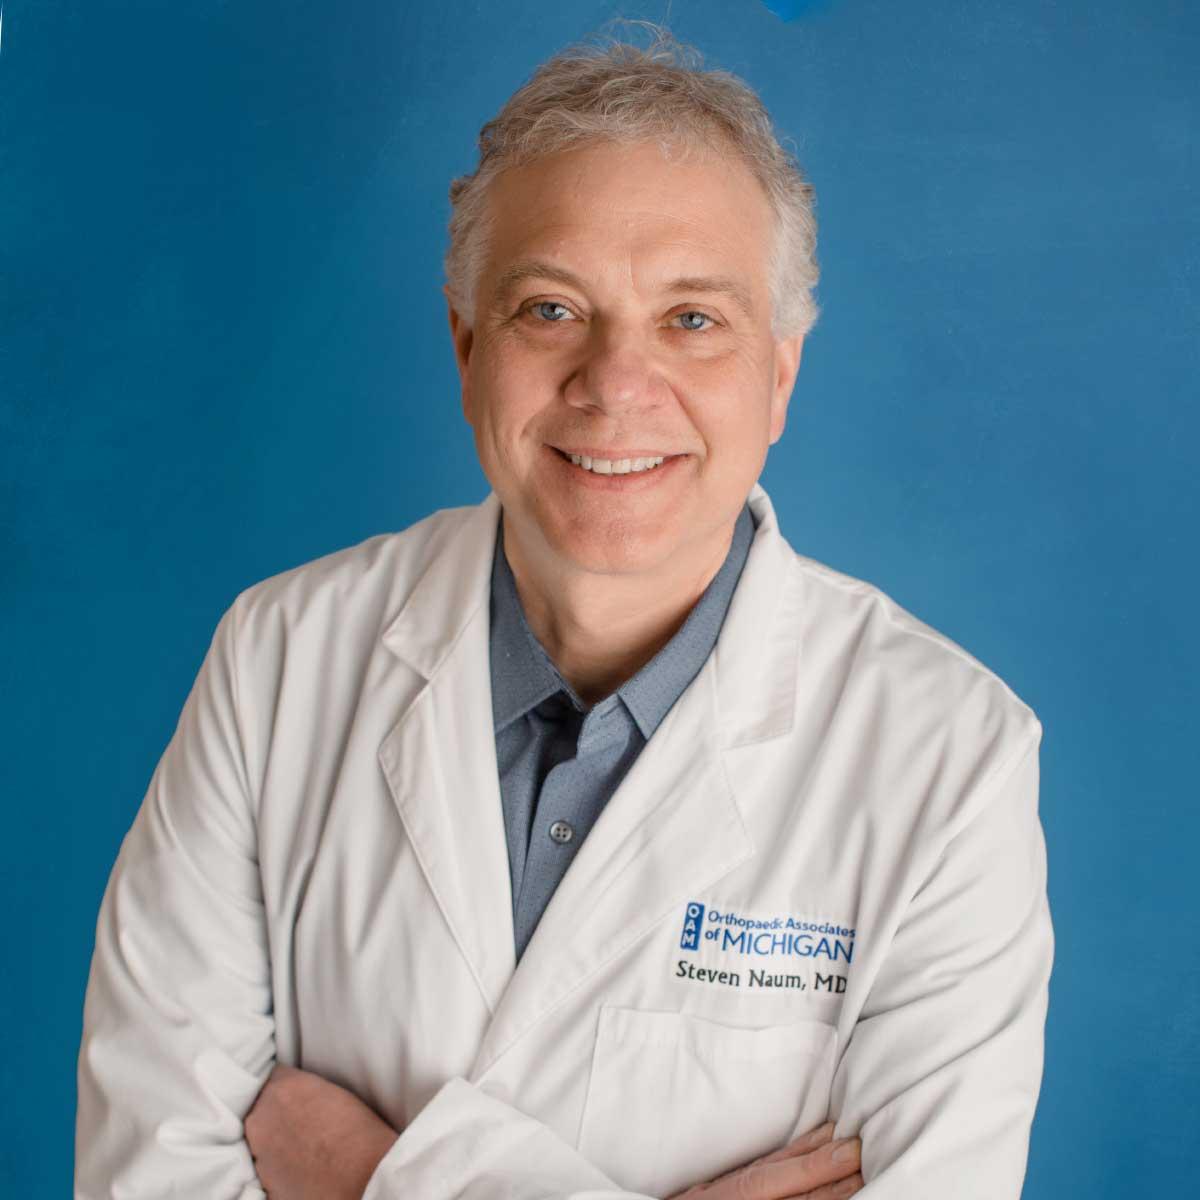 Steve Naum, MD